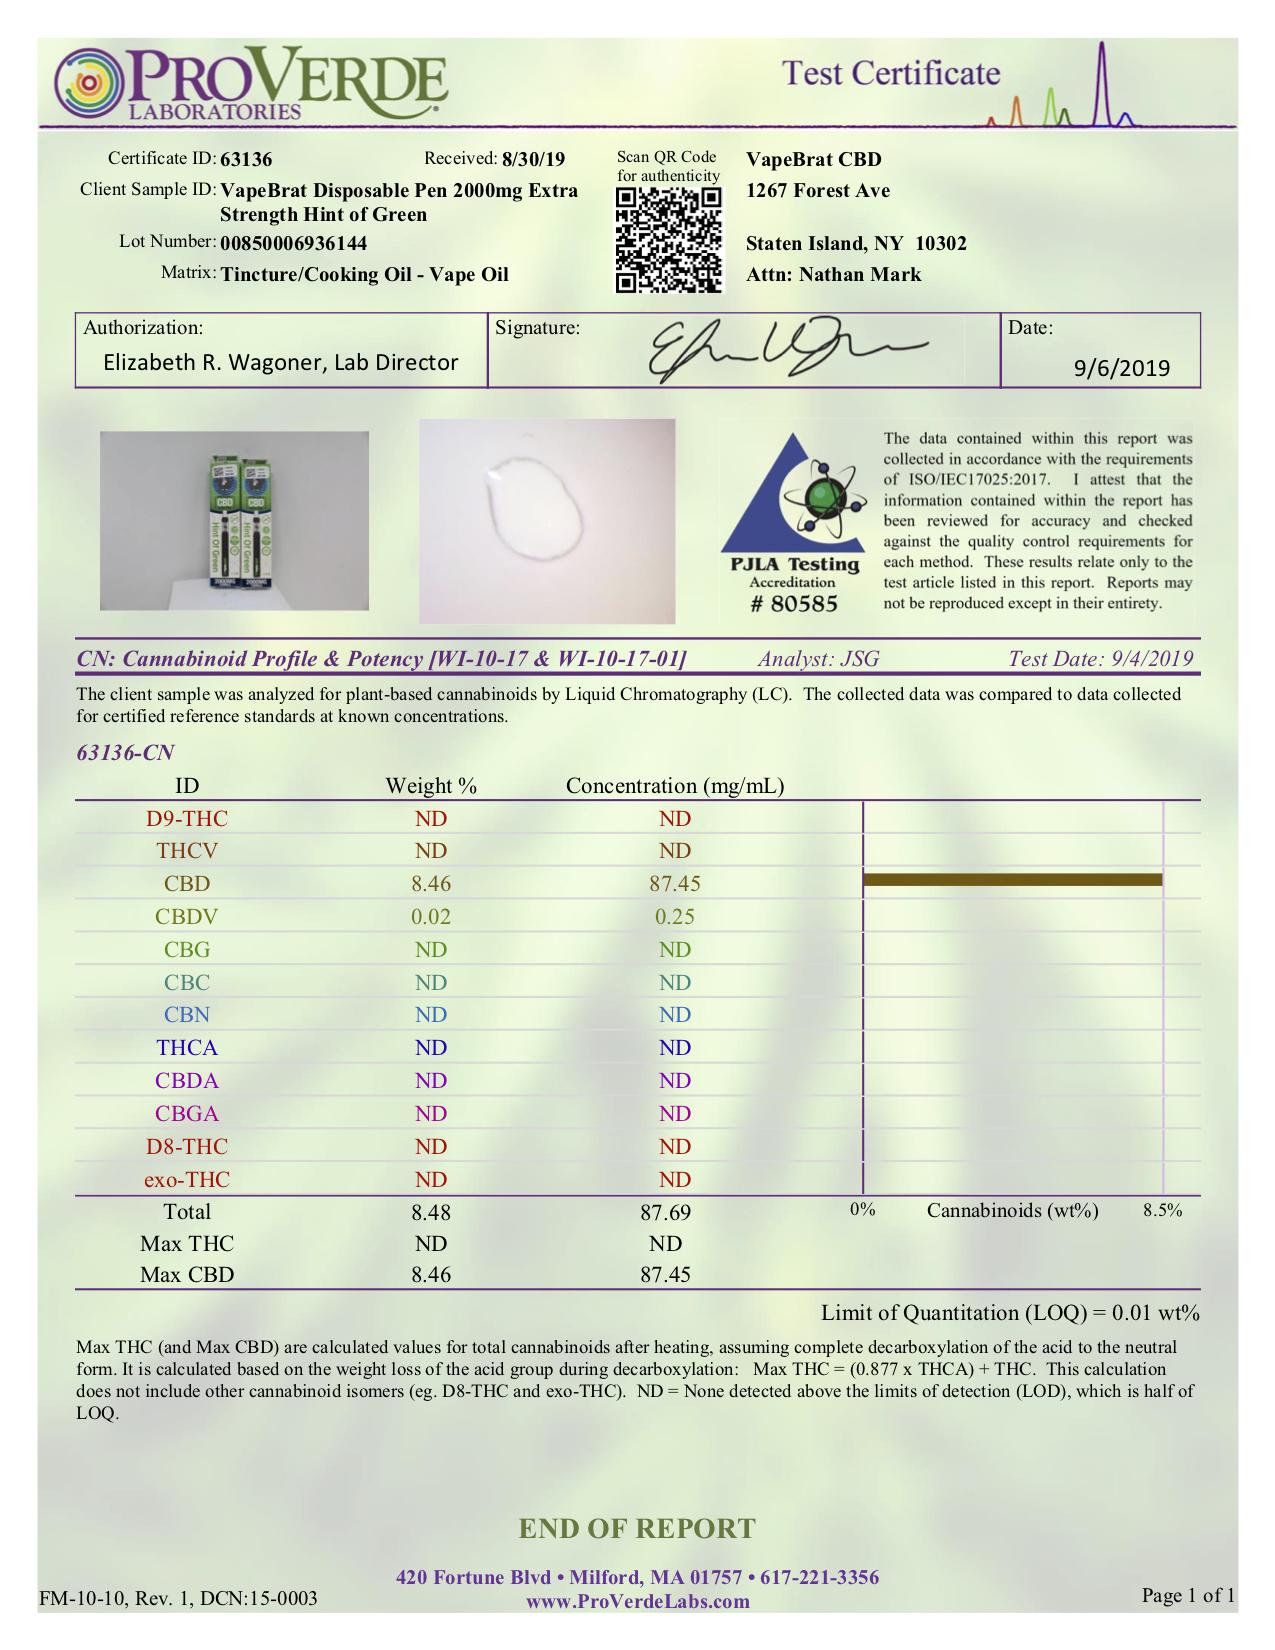 63136-vapebrat-disposable-pen-2000mg-extra-strength-hint-of-green.jpg